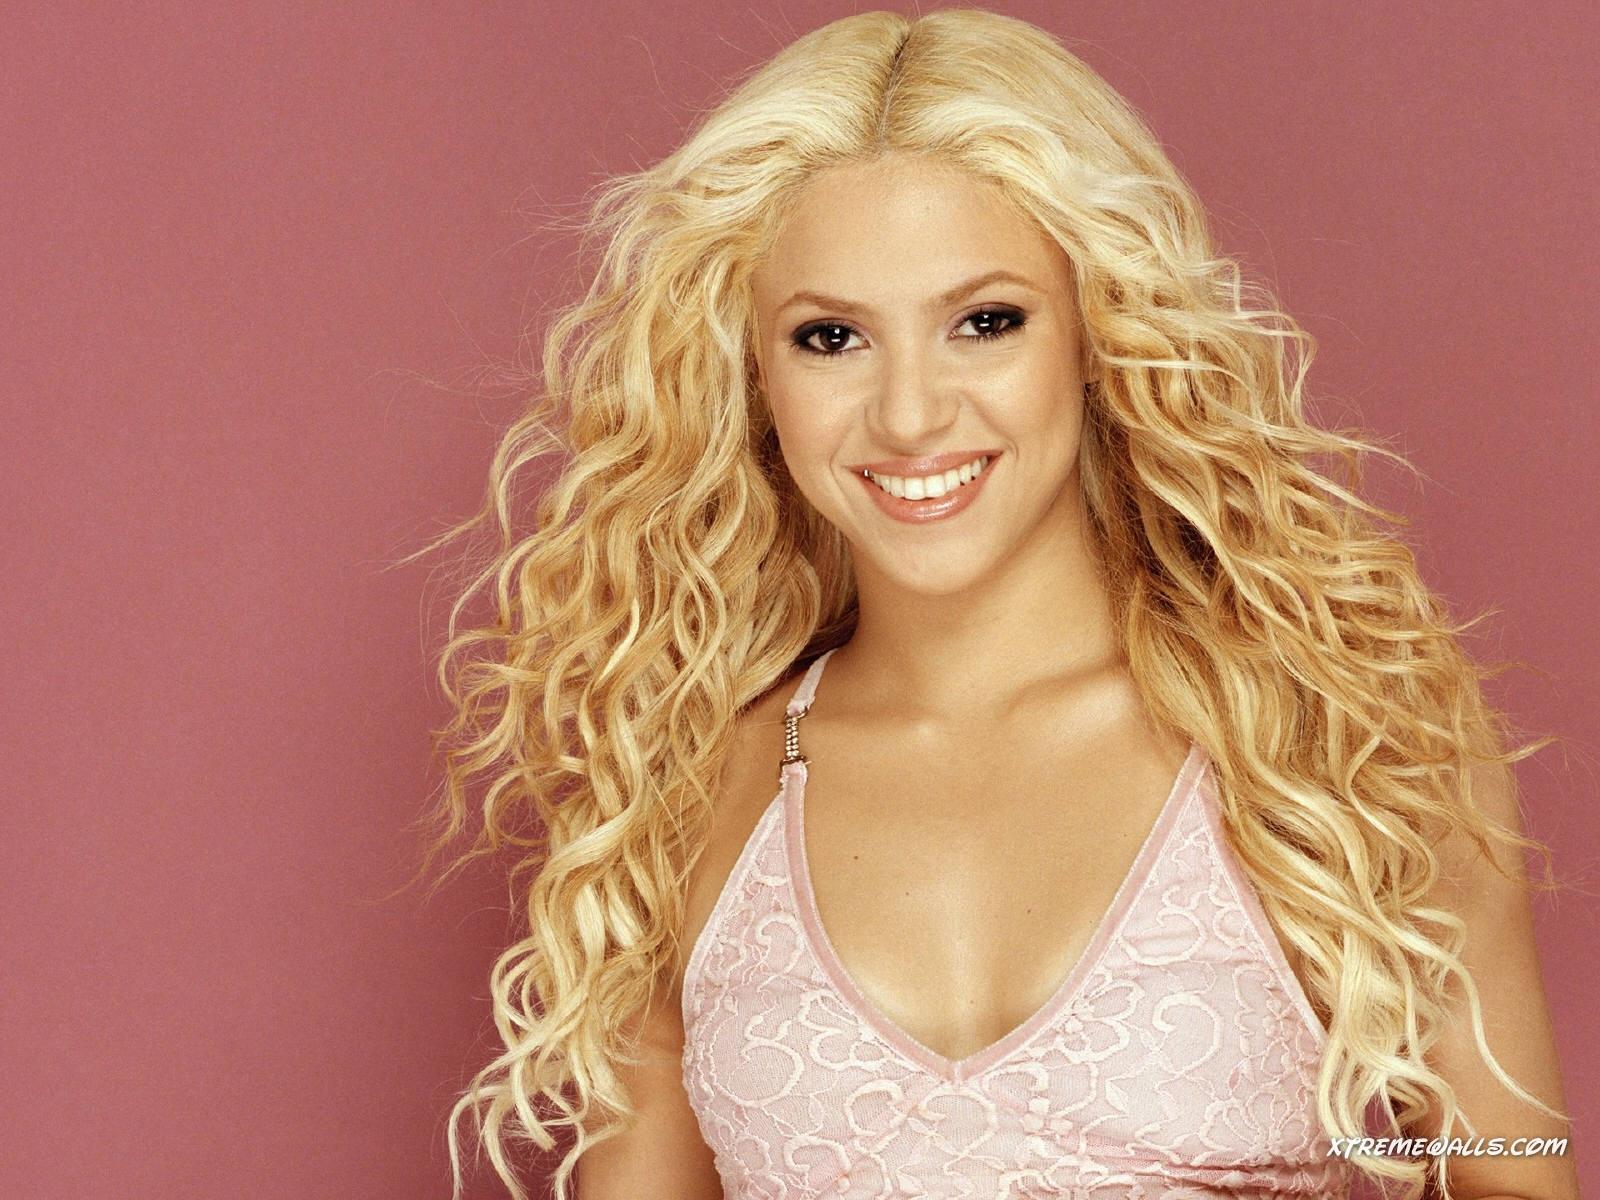 Celebrities Of 2012 Shakira Hot  Sexy Wallpapers, Shakira Photo -6169